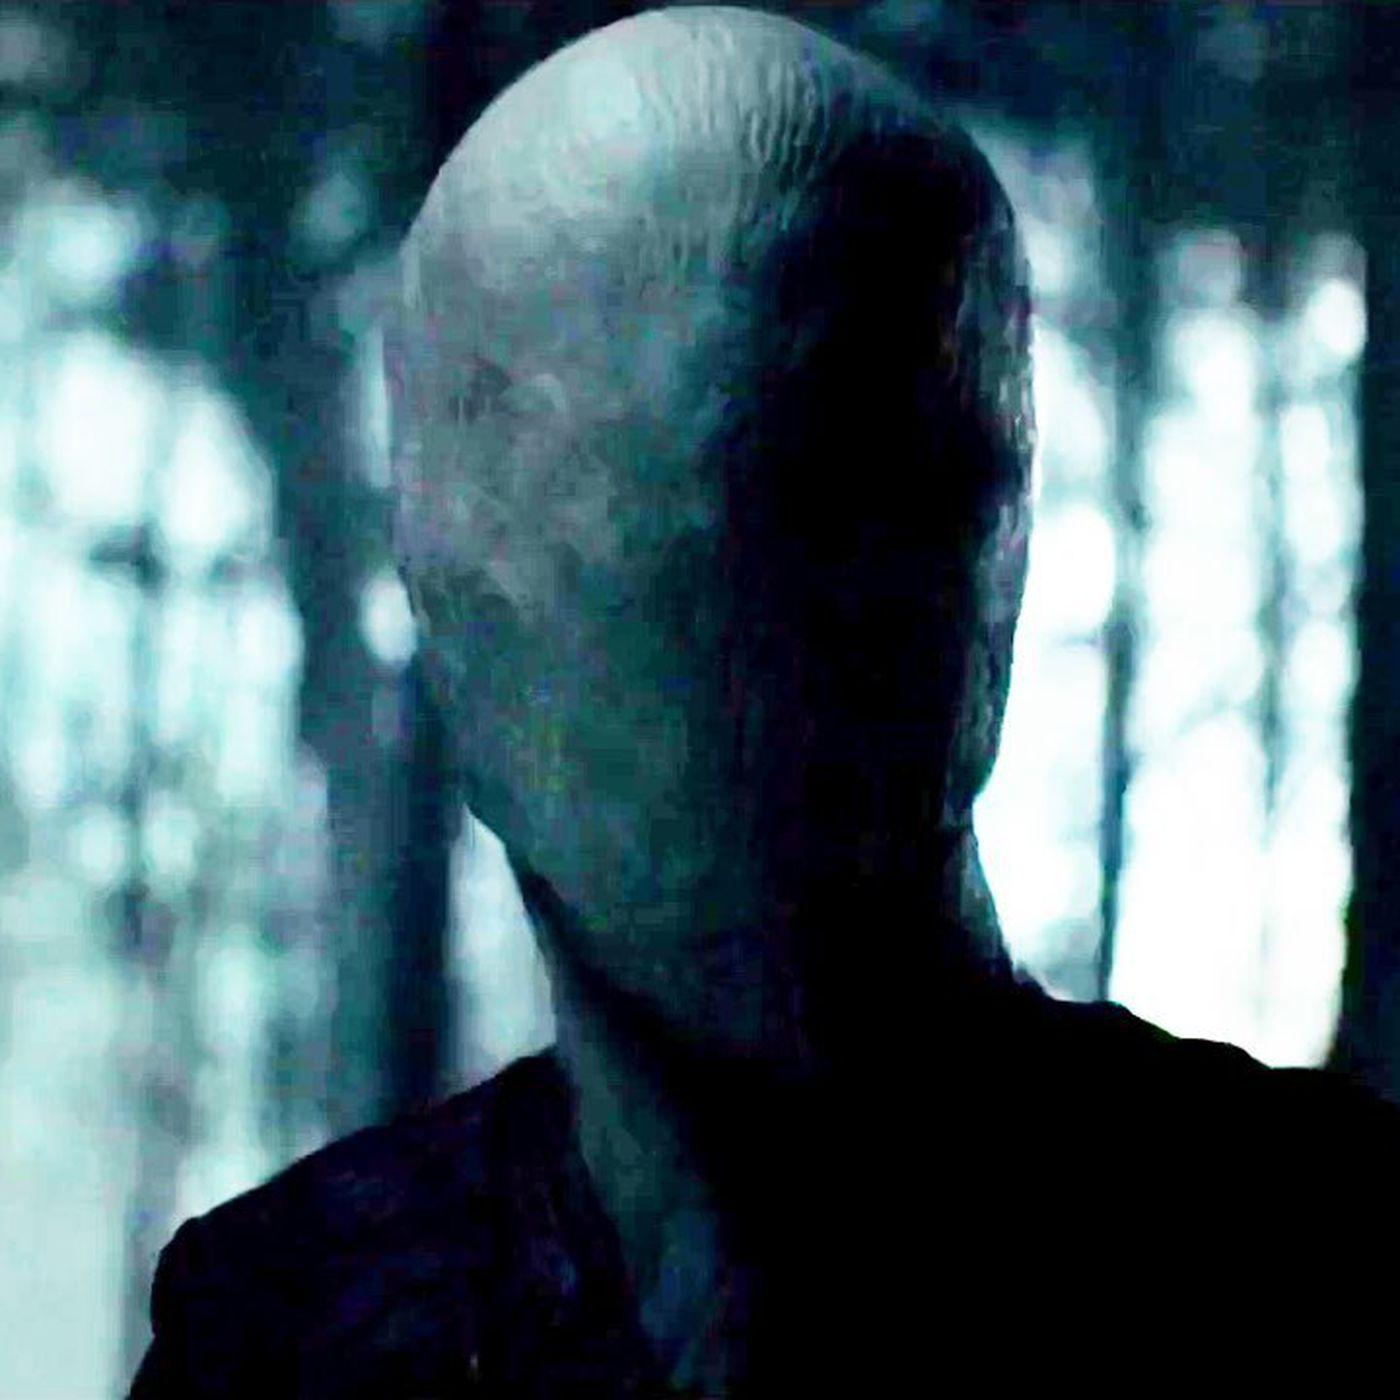 slender man s ending ignores internet myth and real life